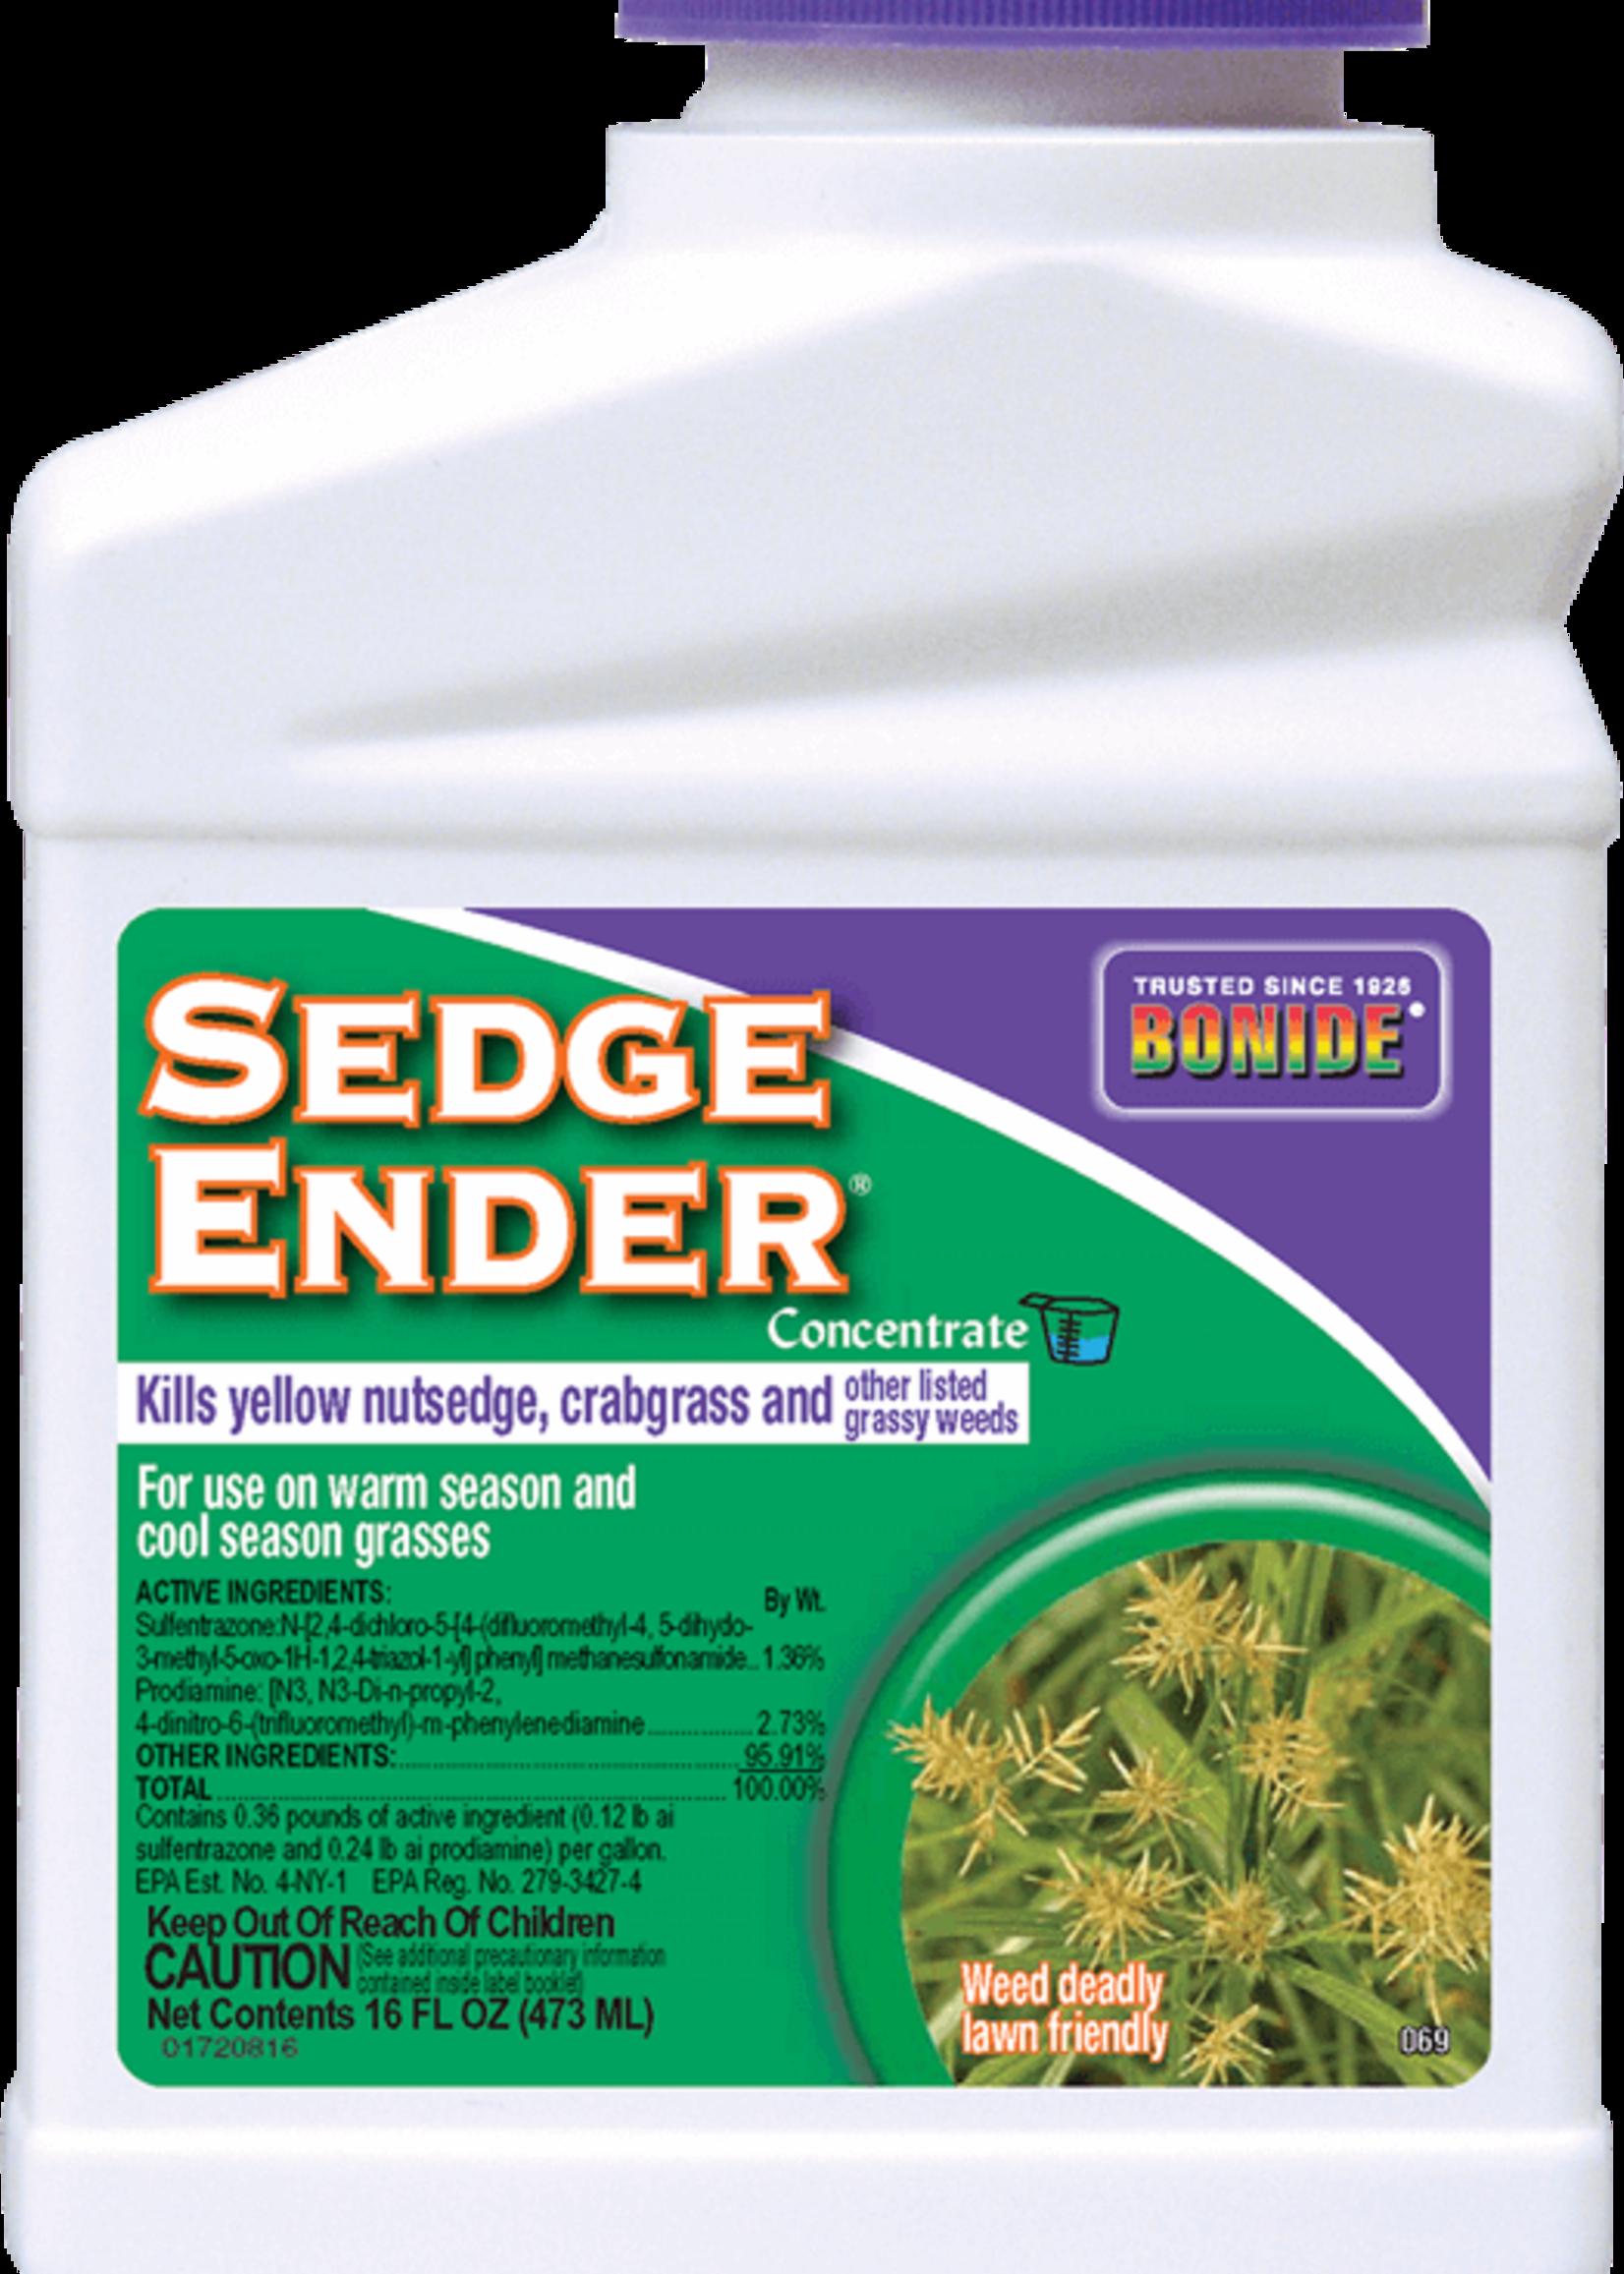 Bonide Sedge Ender conc. 16 oz.